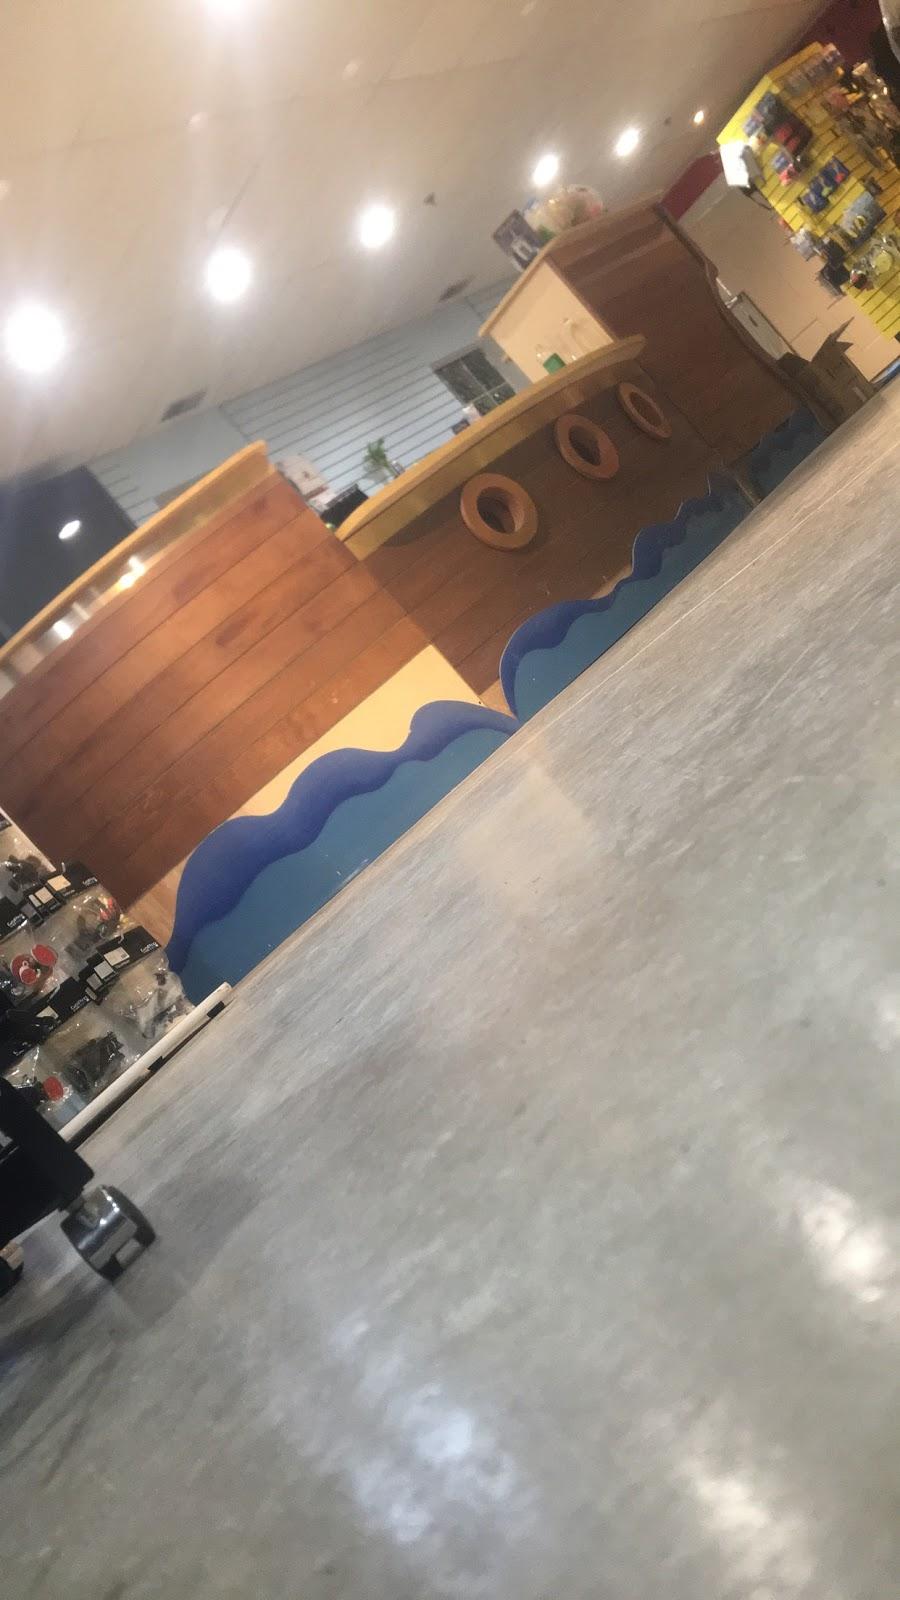 Berry Scuba & Swim School - travel agency  | Photo 9 of 10 | Address: 200 Northfield Rd, Northfield, IL 60093, USA | Phone: (847) 827-3100